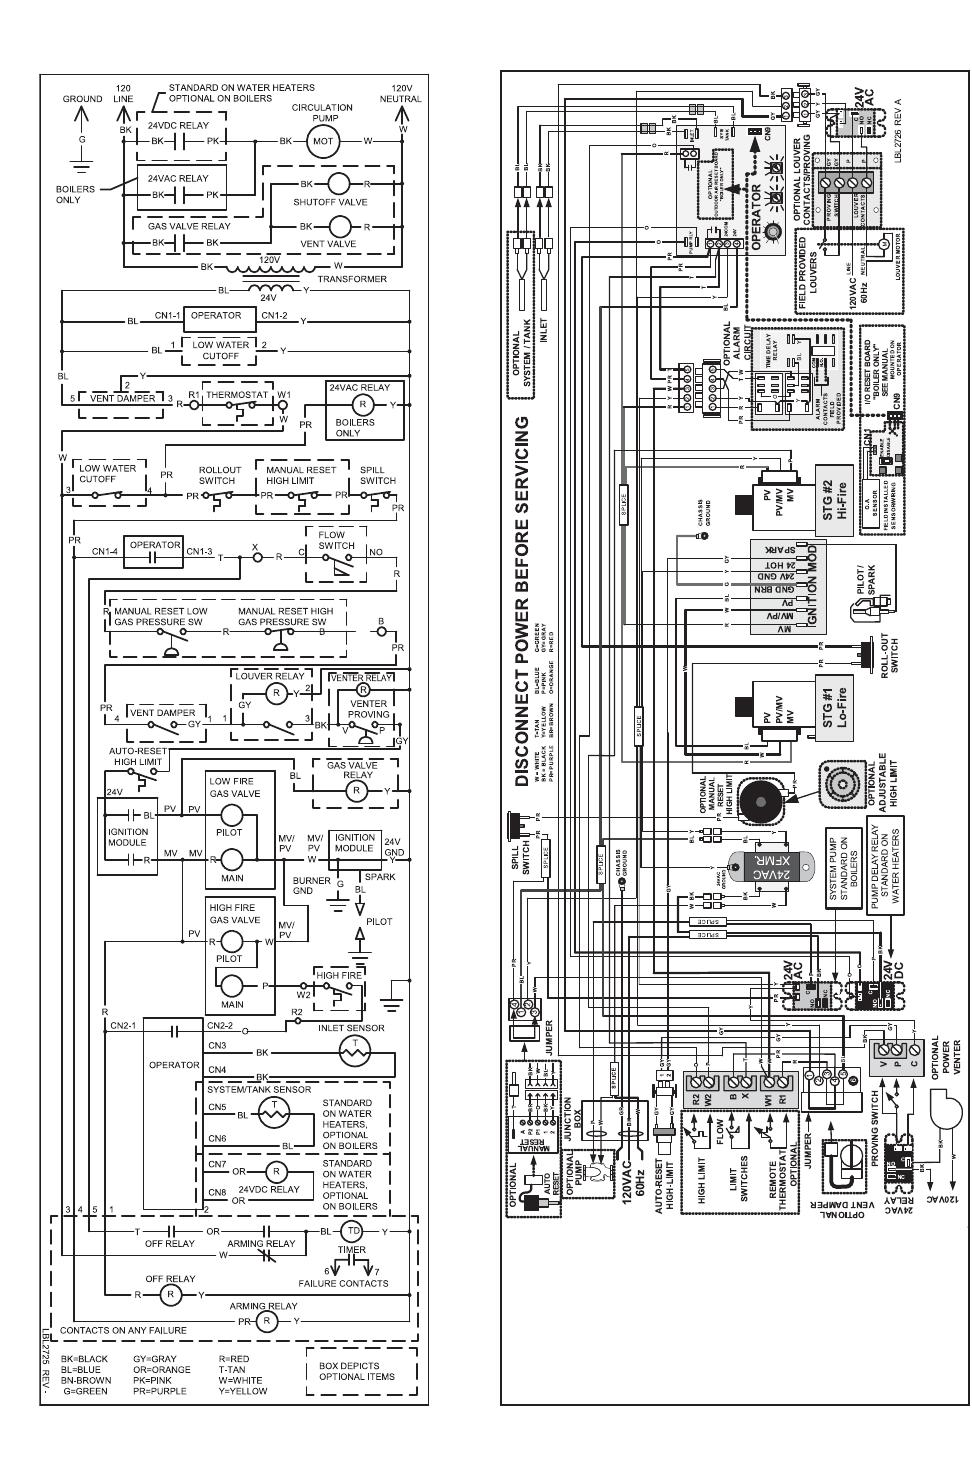 hight resolution of lochinvar schematic diagram f9 m9 unit 500 000 btu hr models wiring diagram f9 m9 unit 500 000 btu hr models